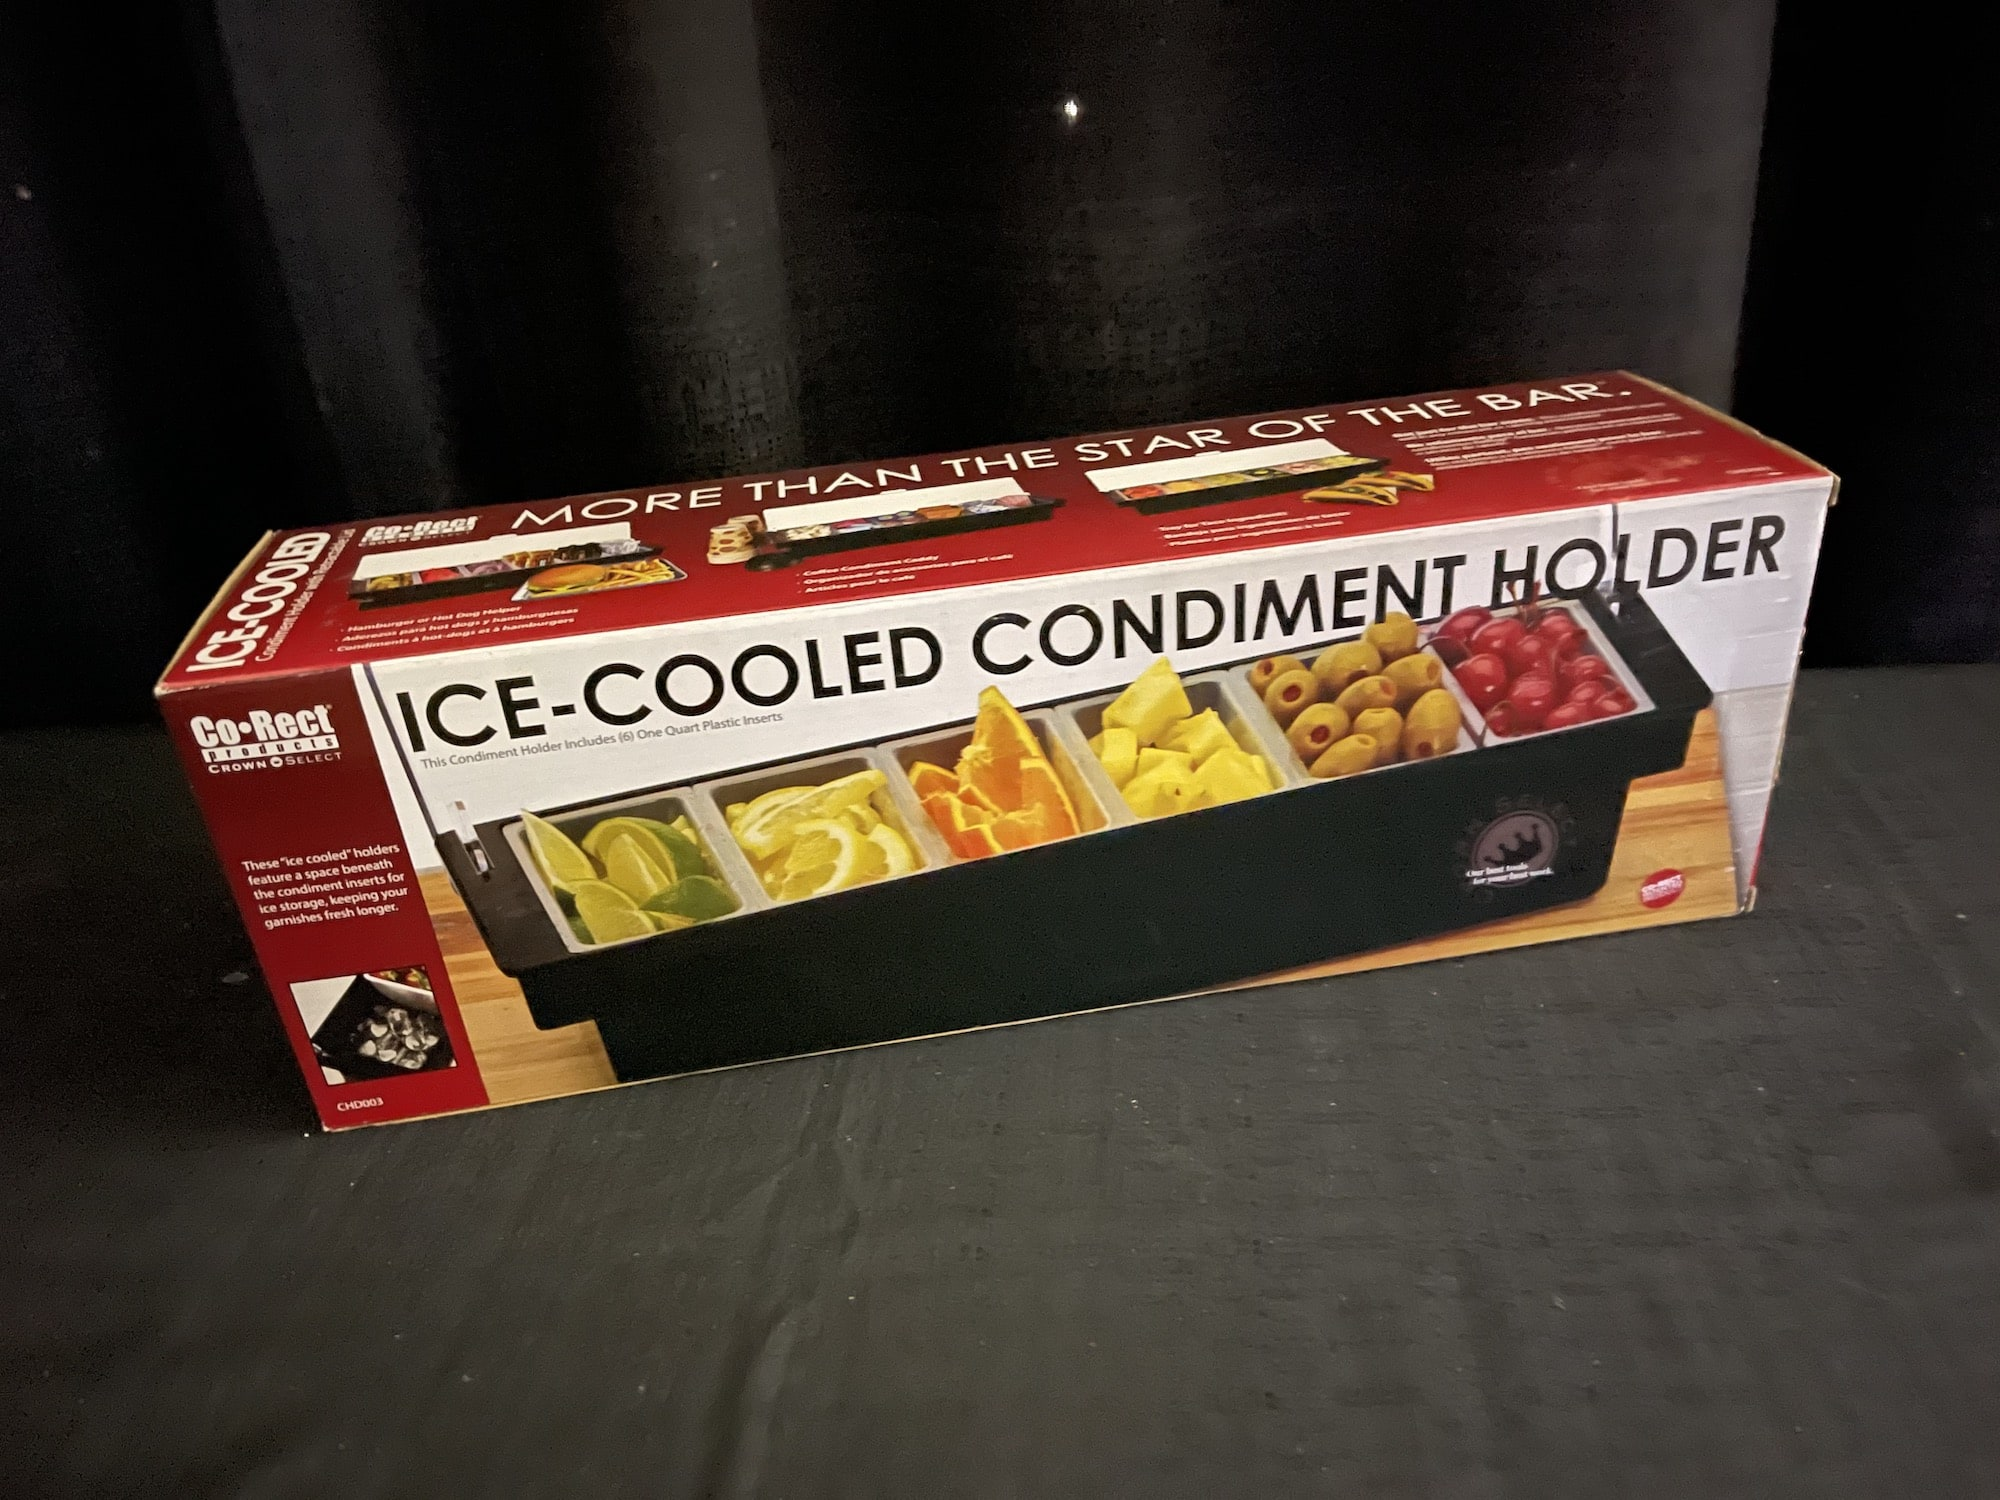 Condiment holder